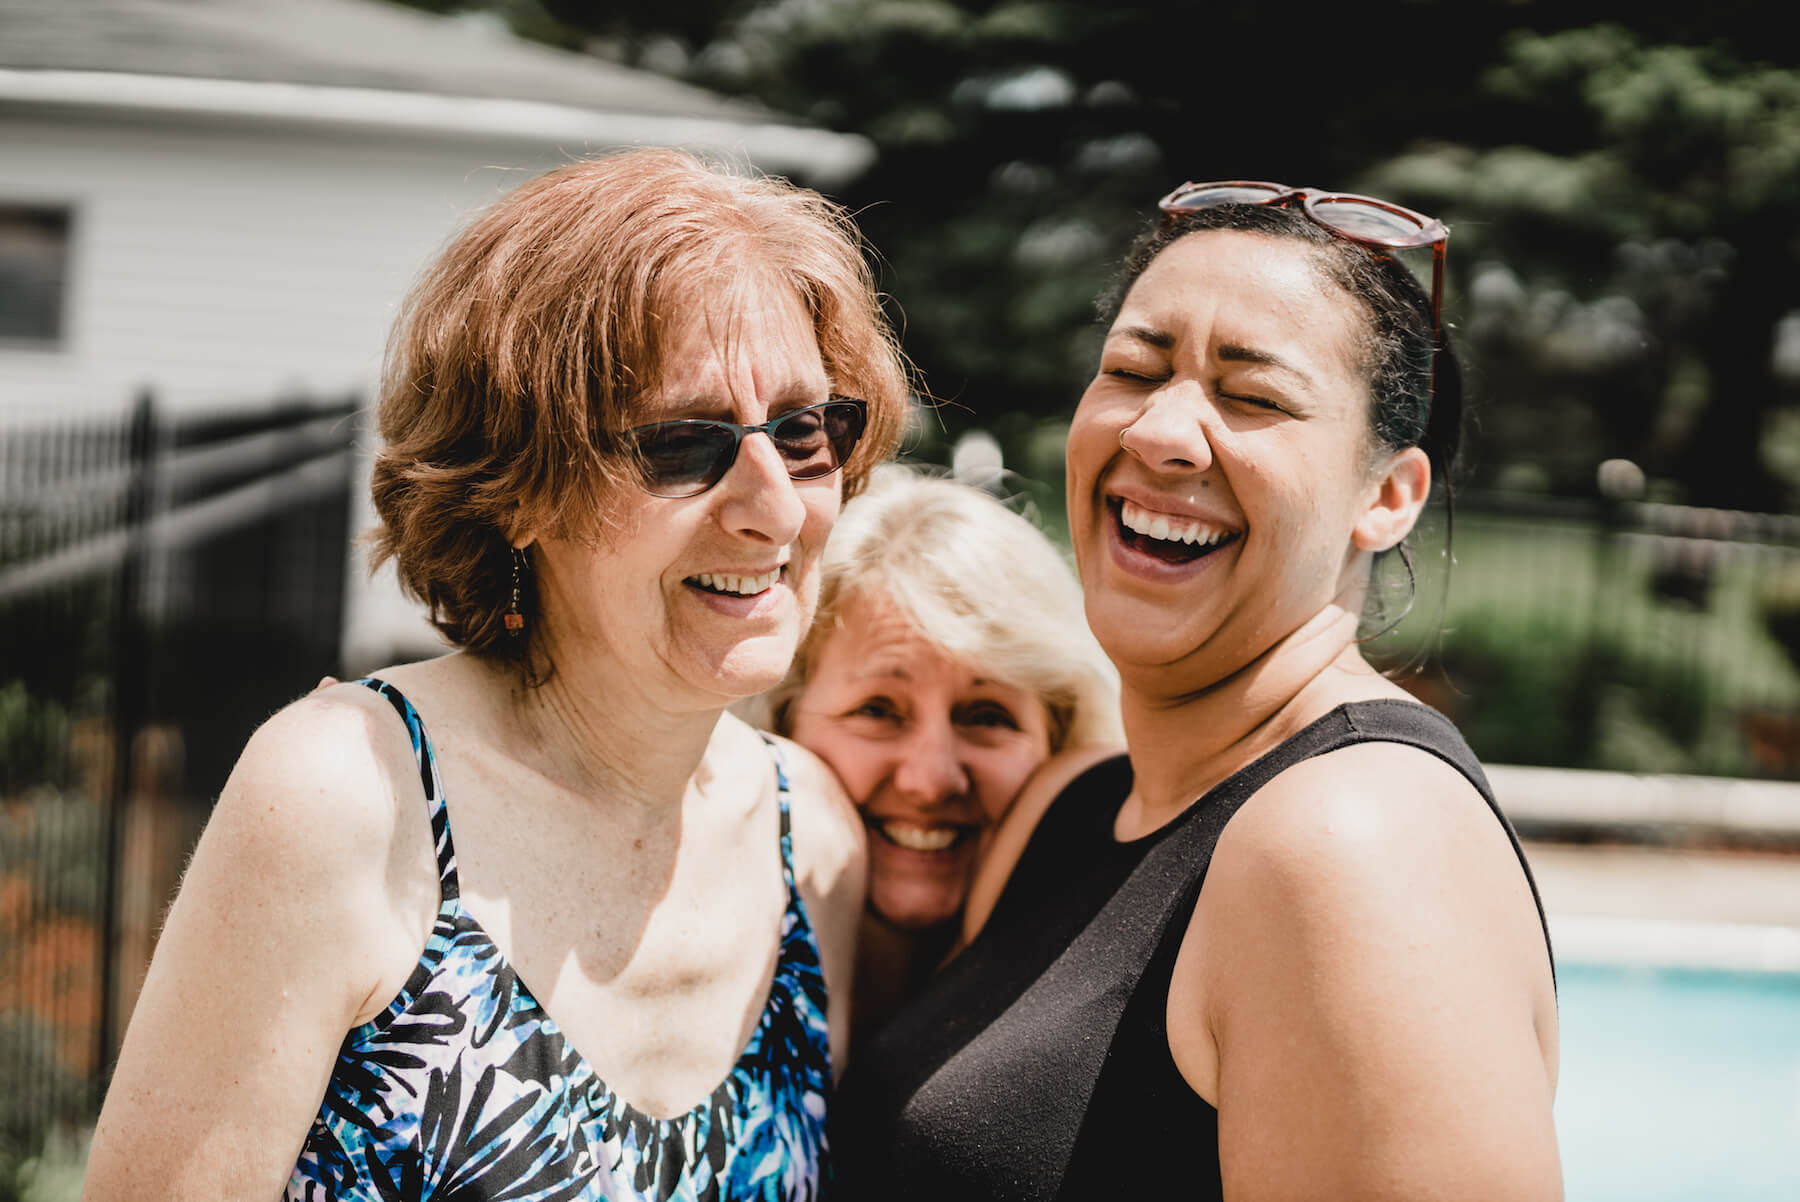 engle-olson-chicago-family-reunion-36.jpg